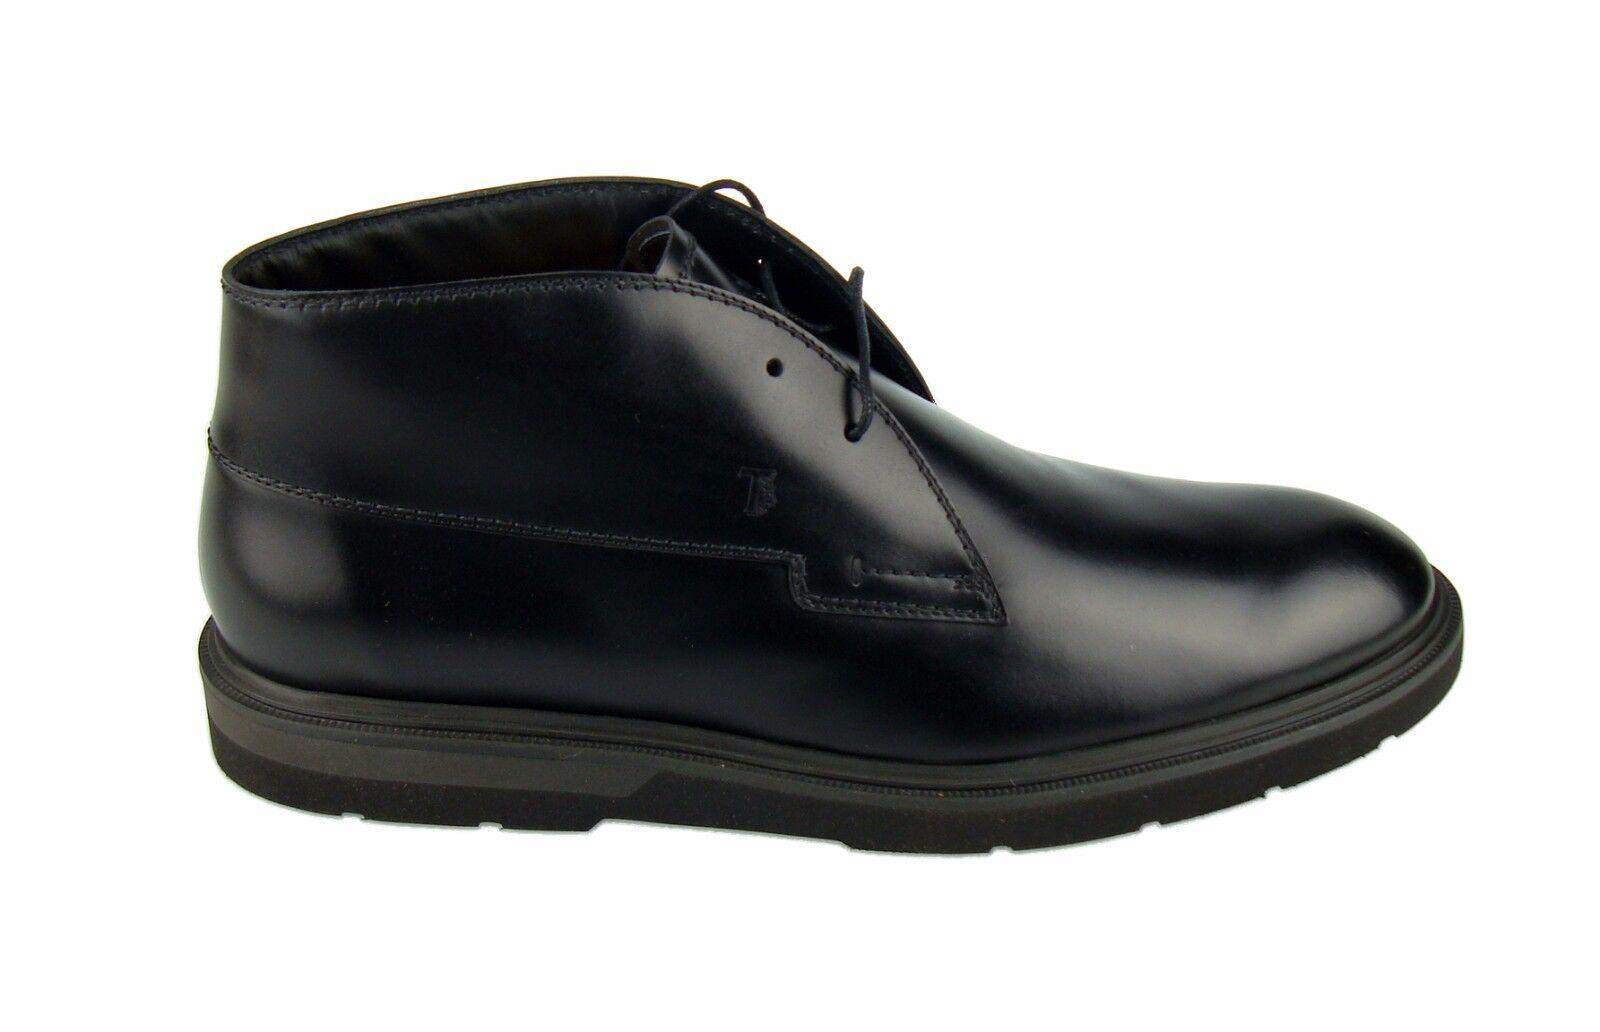 Tod's Stiefel herrenschuhe AUS LEDER  schuhe  herrenschuhe Stiefel men's 100% authentic b0b5ee